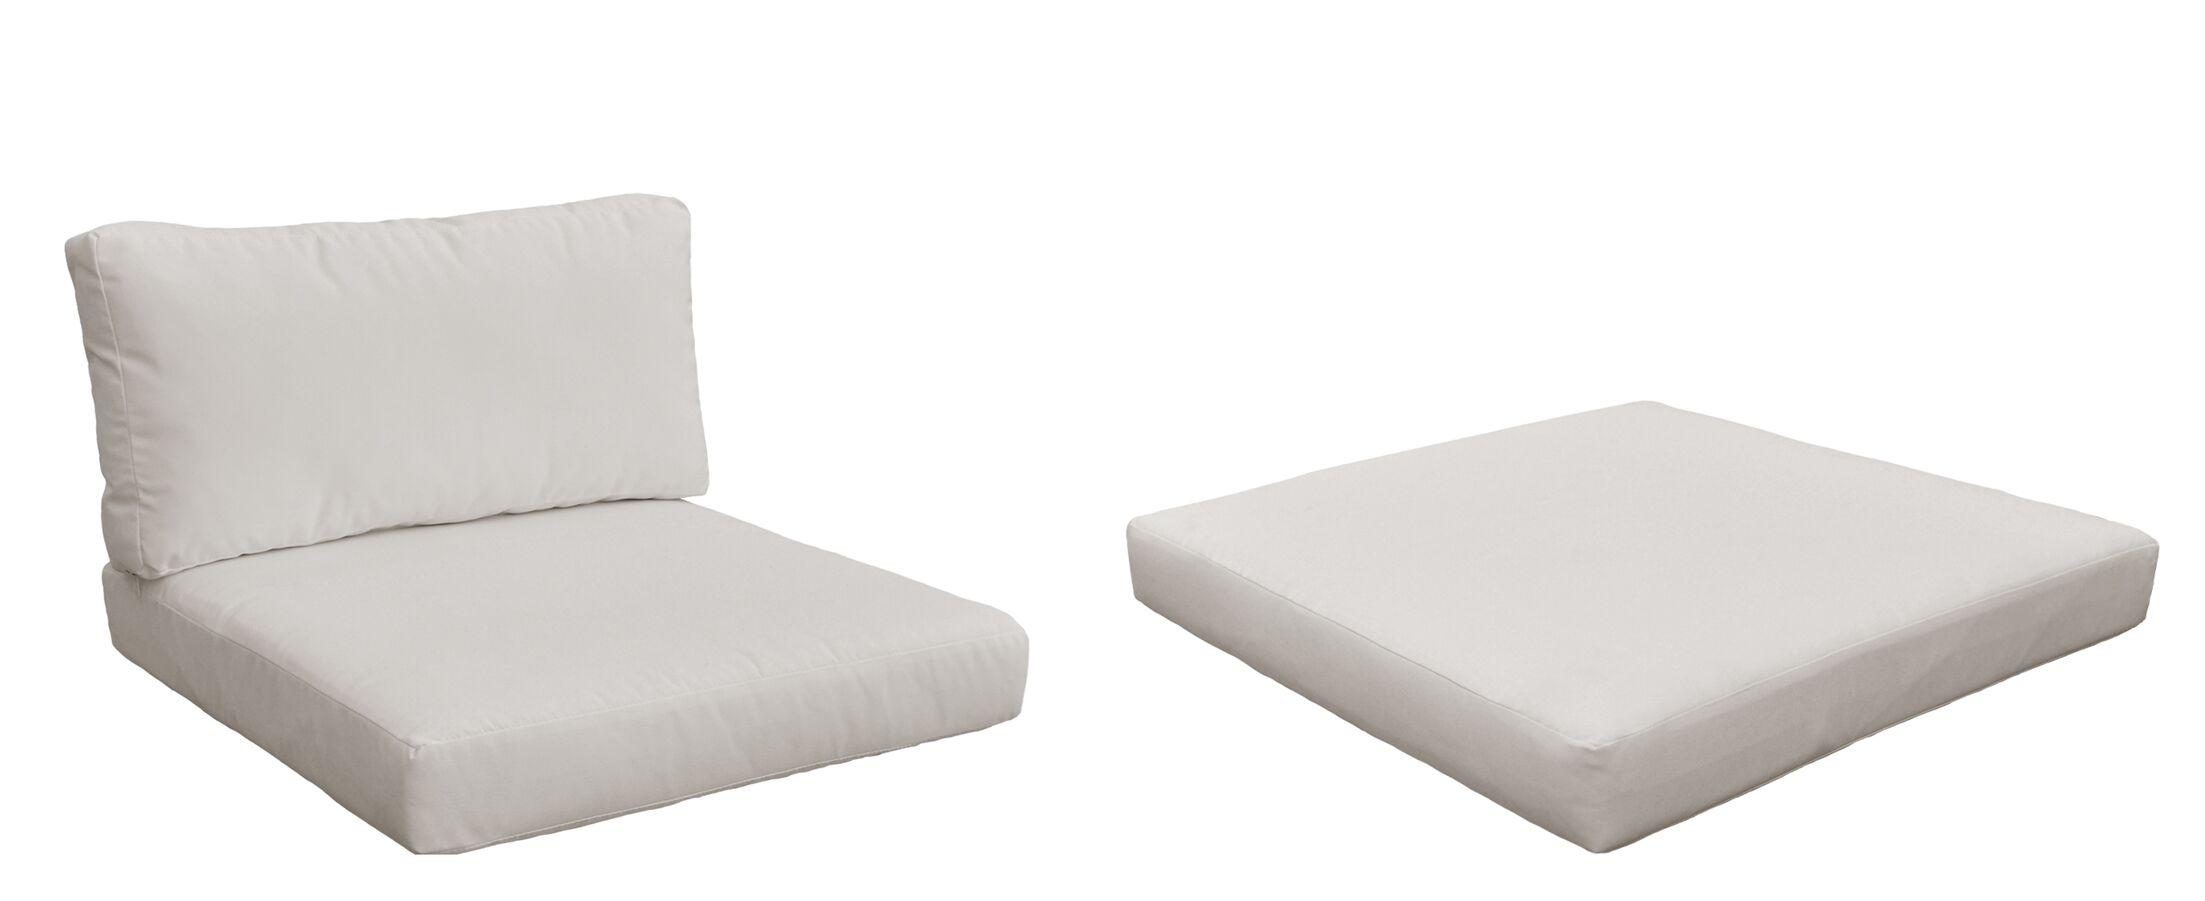 Monaco Outdoor 6 Piece Lounge Chair Cushion Set Fabric: Beige